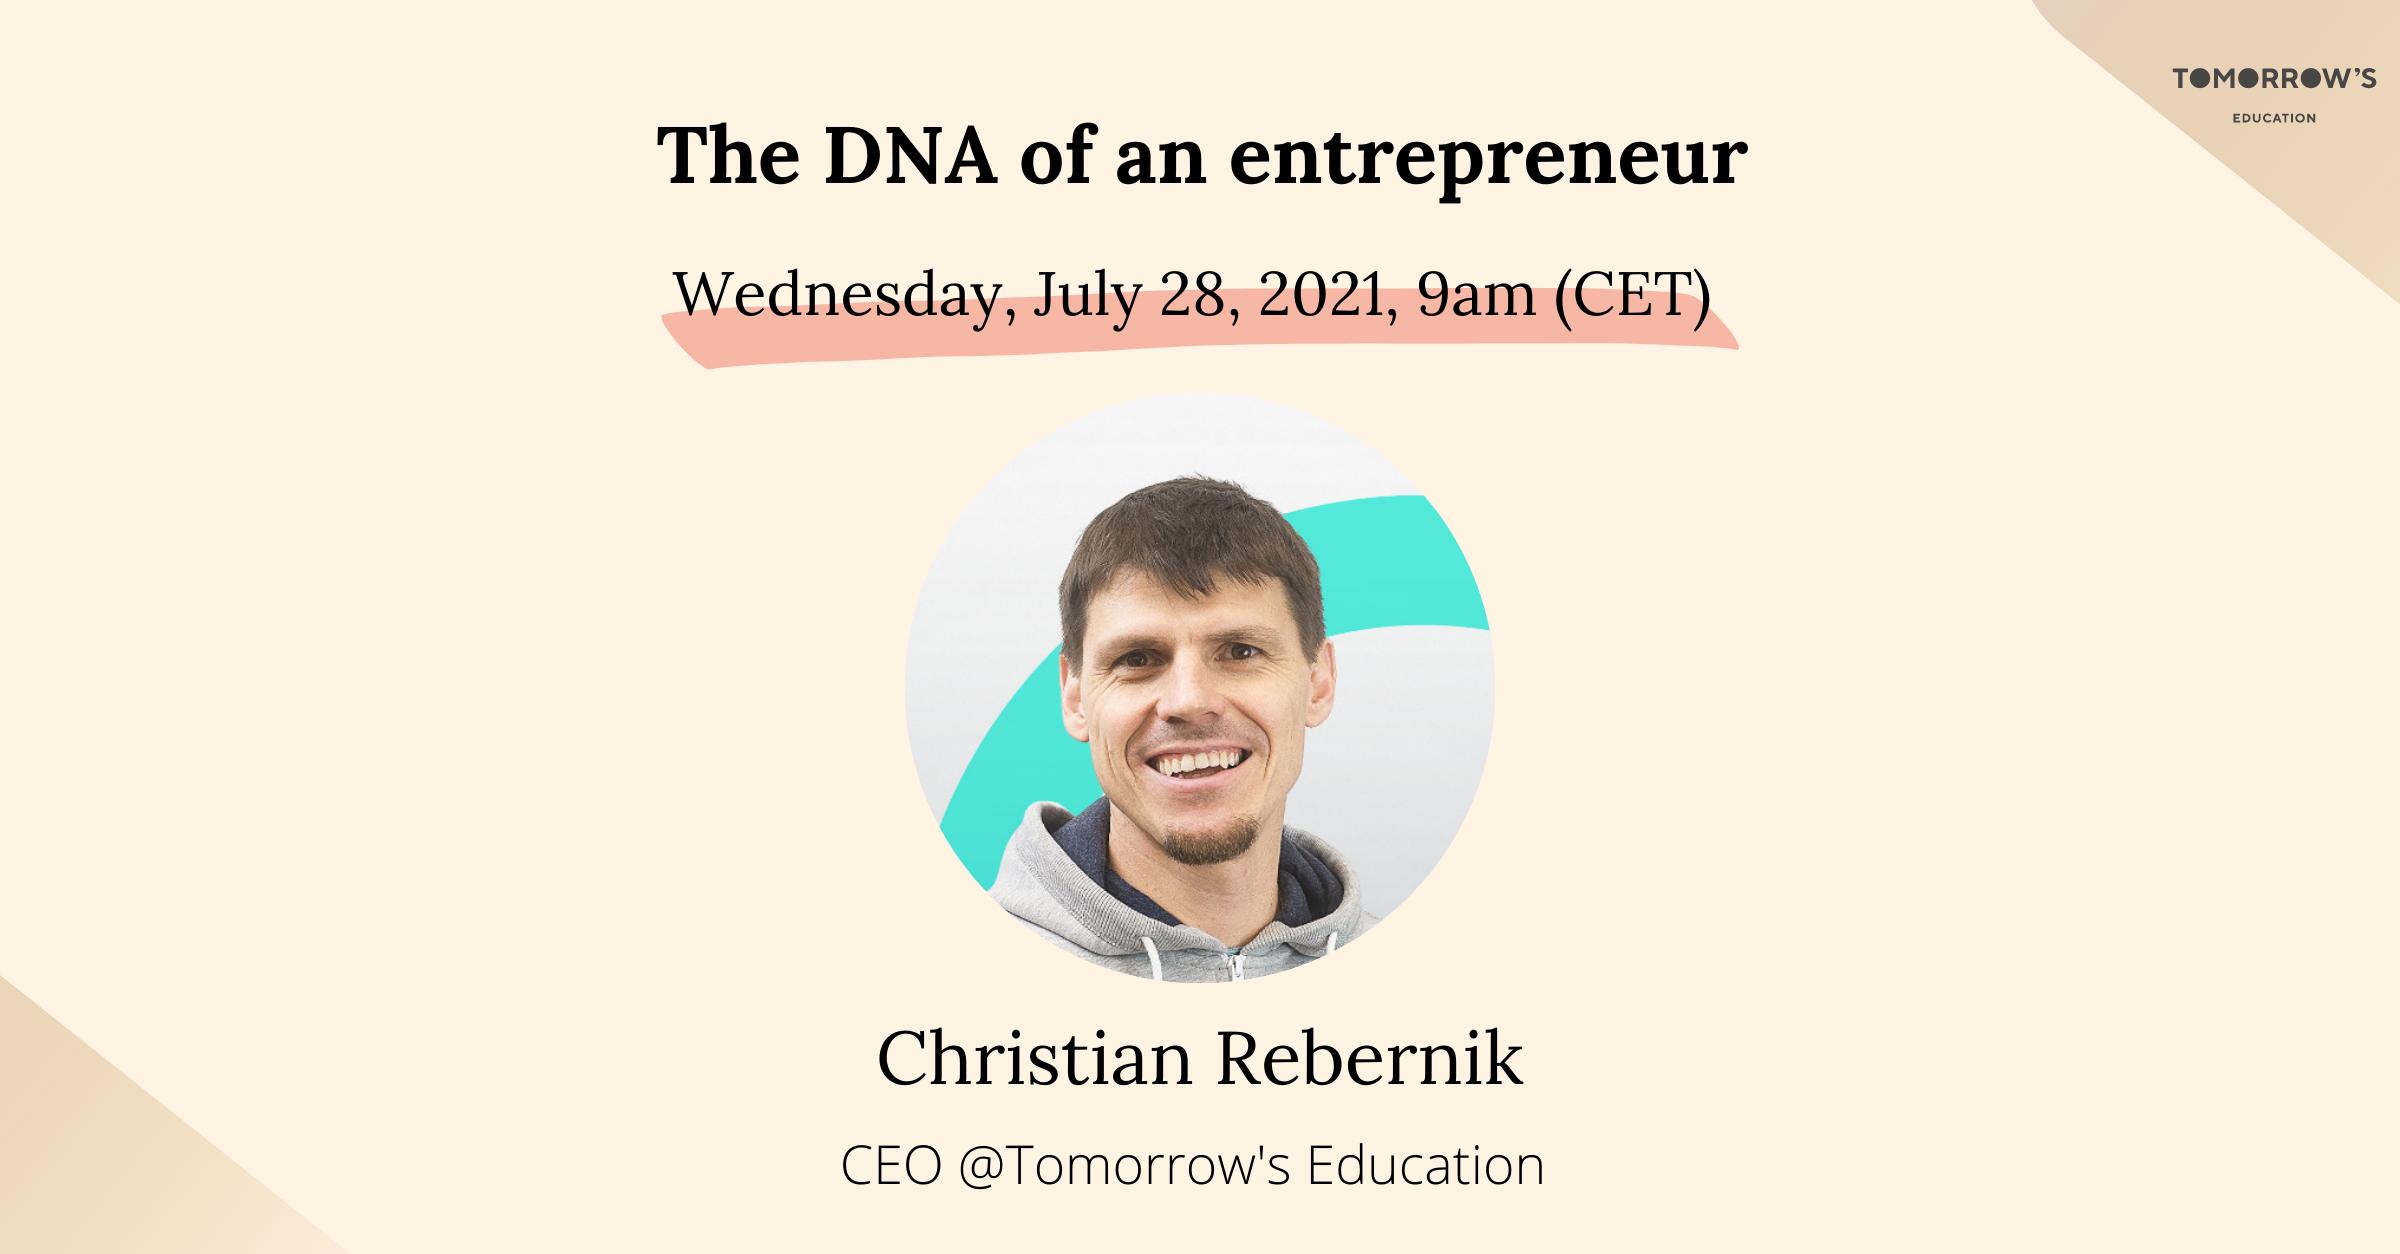 The DNA of an entrepreneur - Christian Rebernik